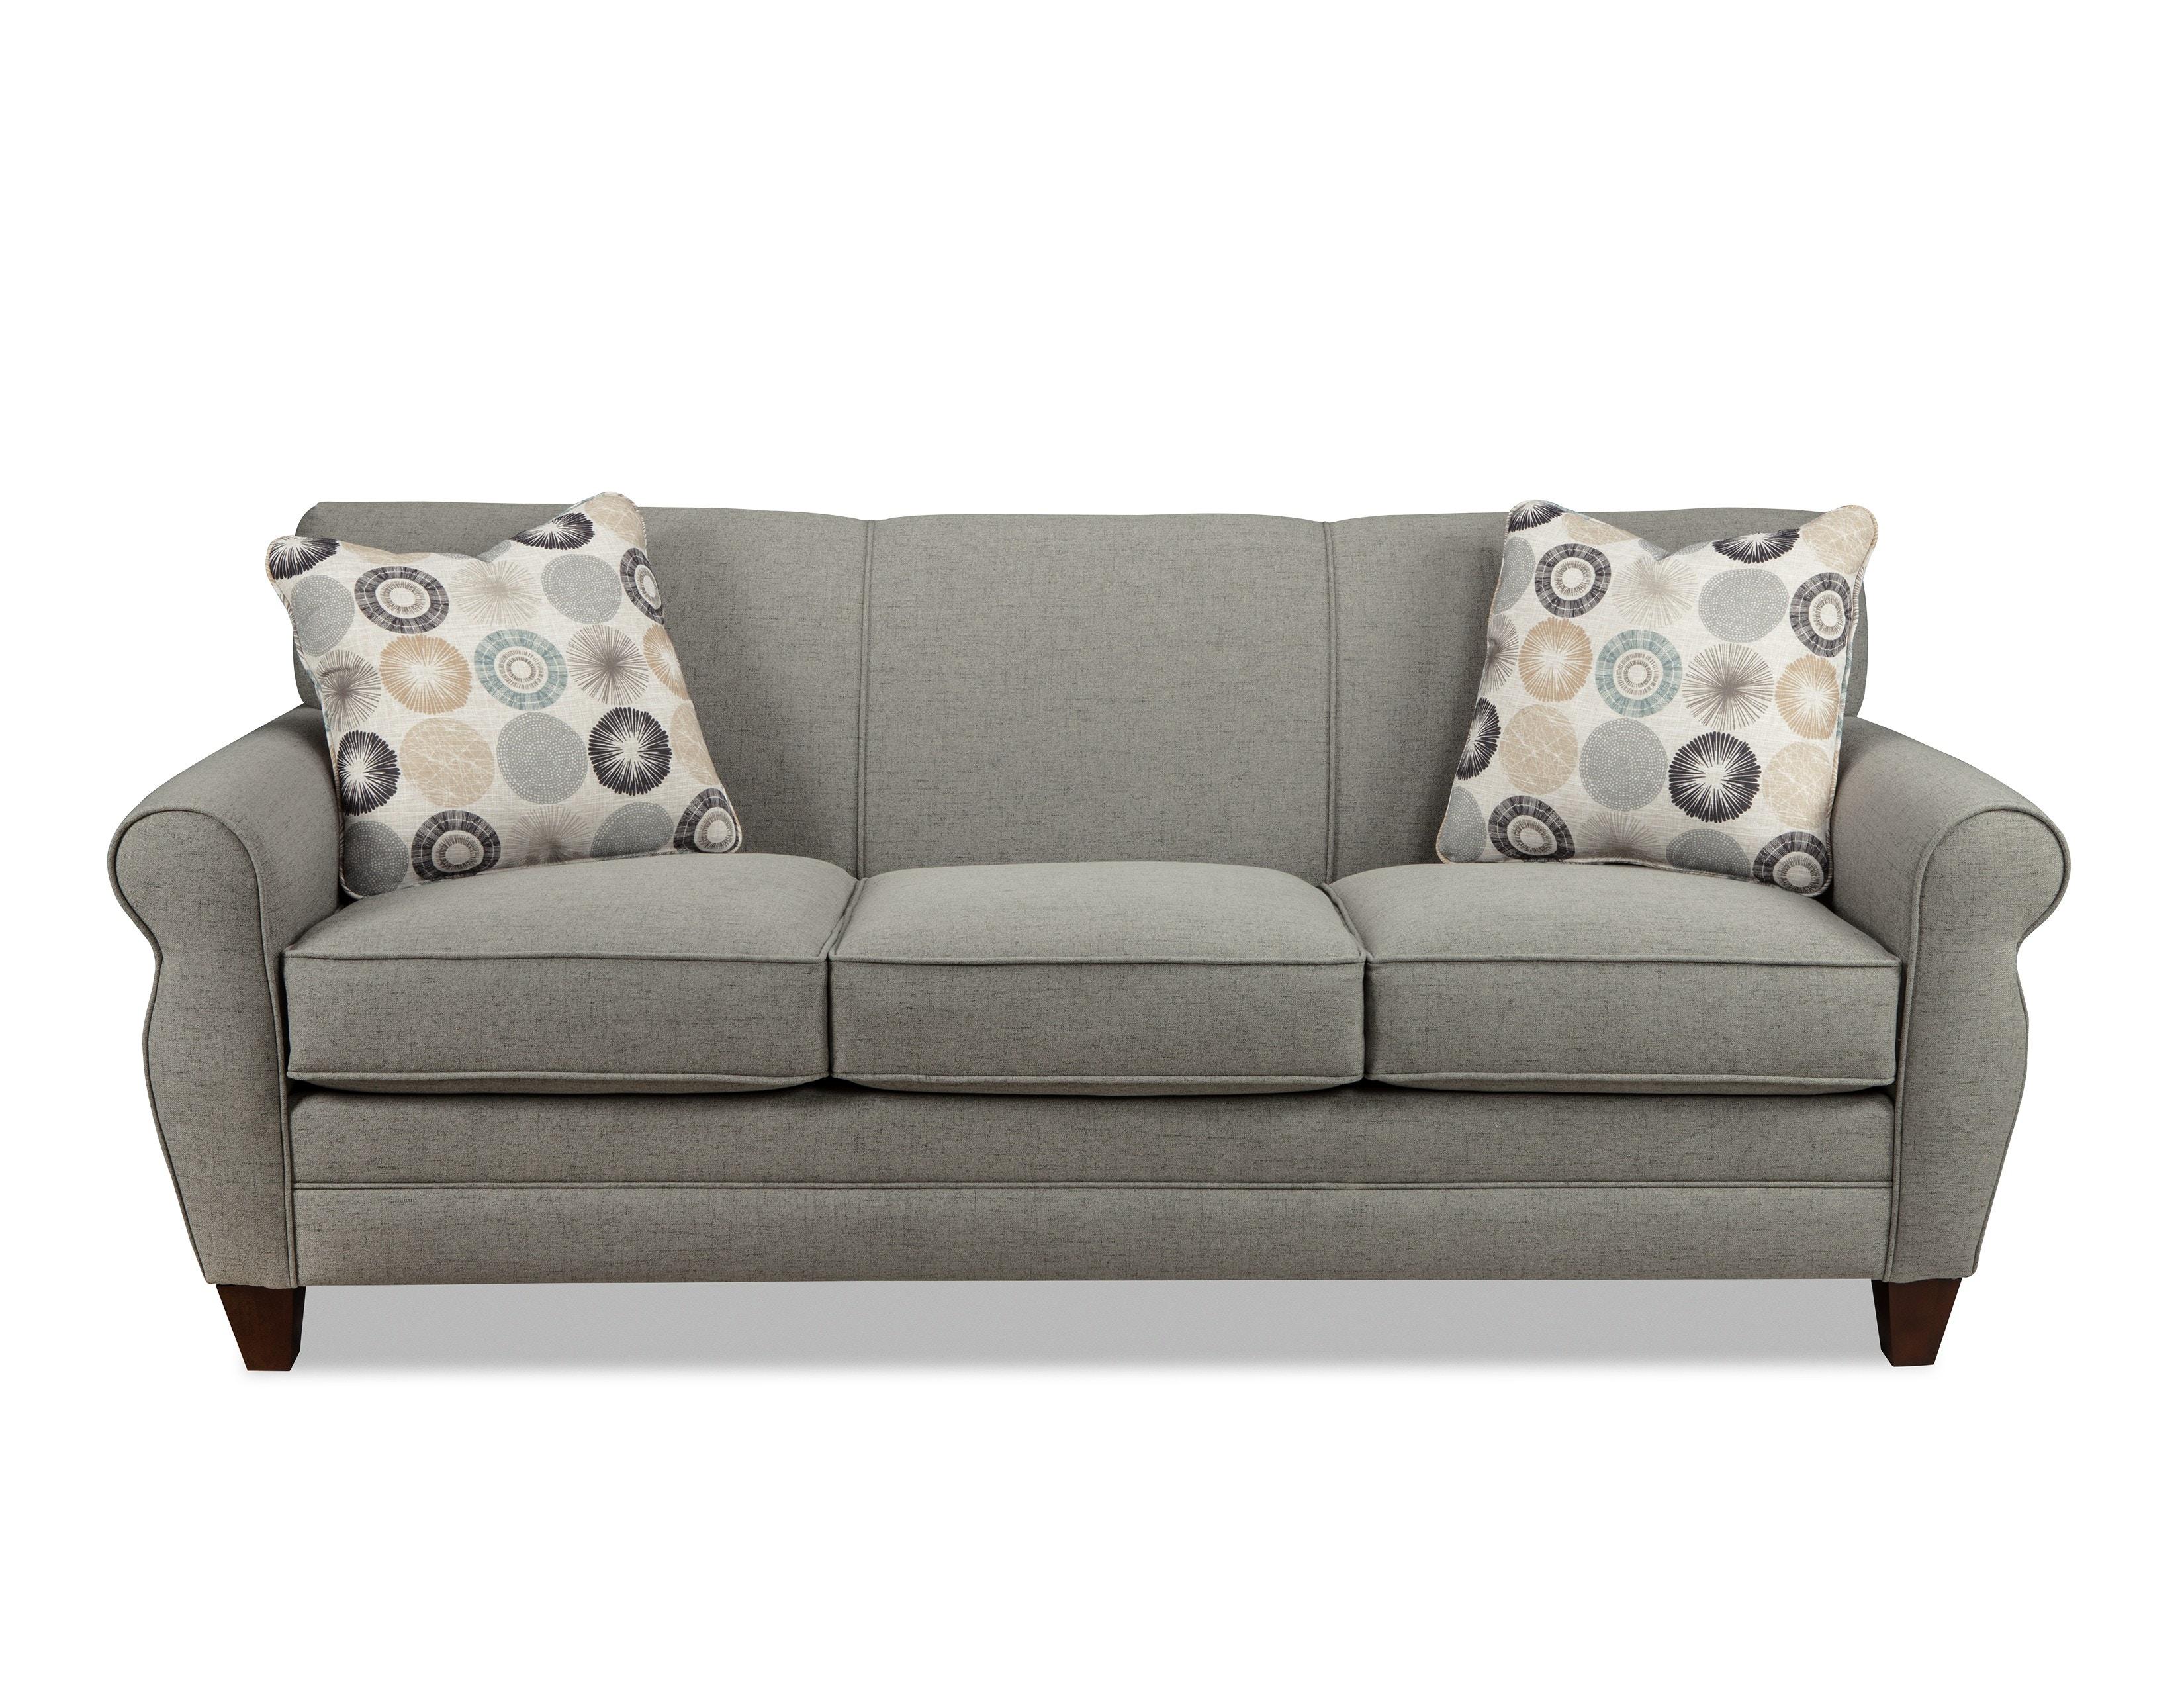 Cozy Life Sofa With Pillows 692258